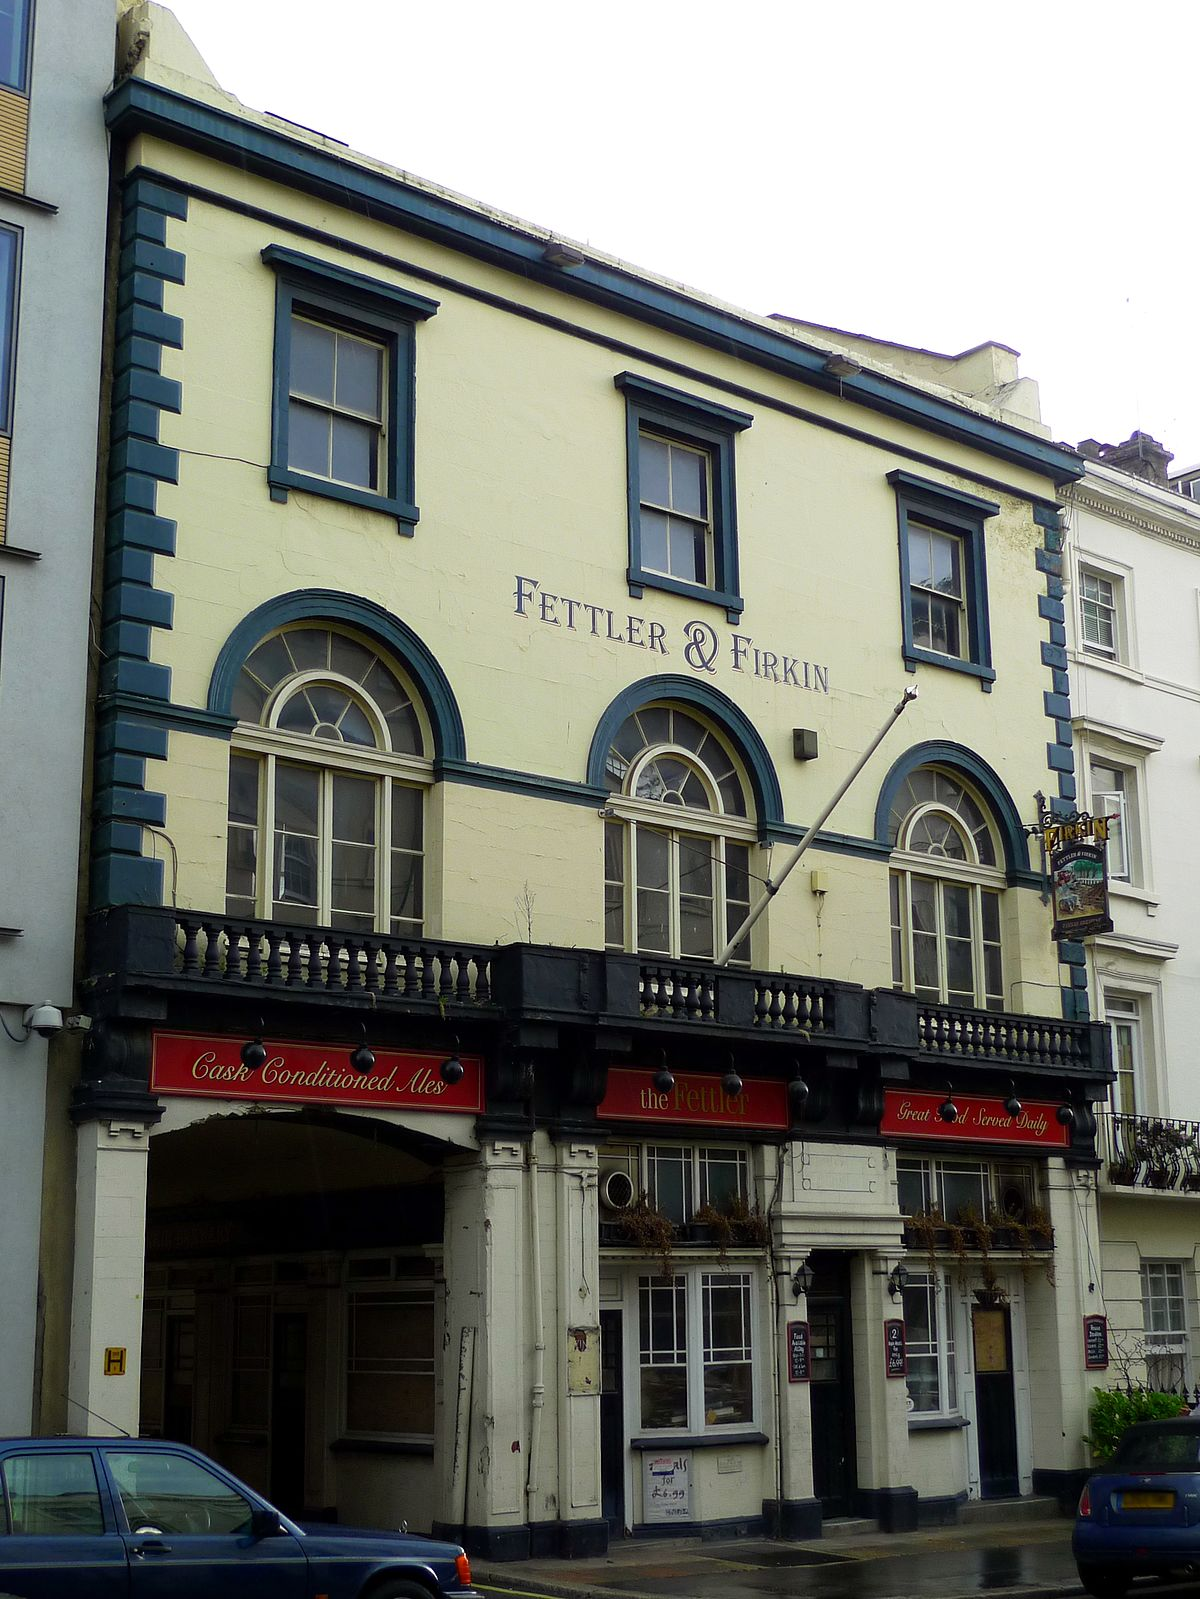 Firkin Brewery - Wikipedia